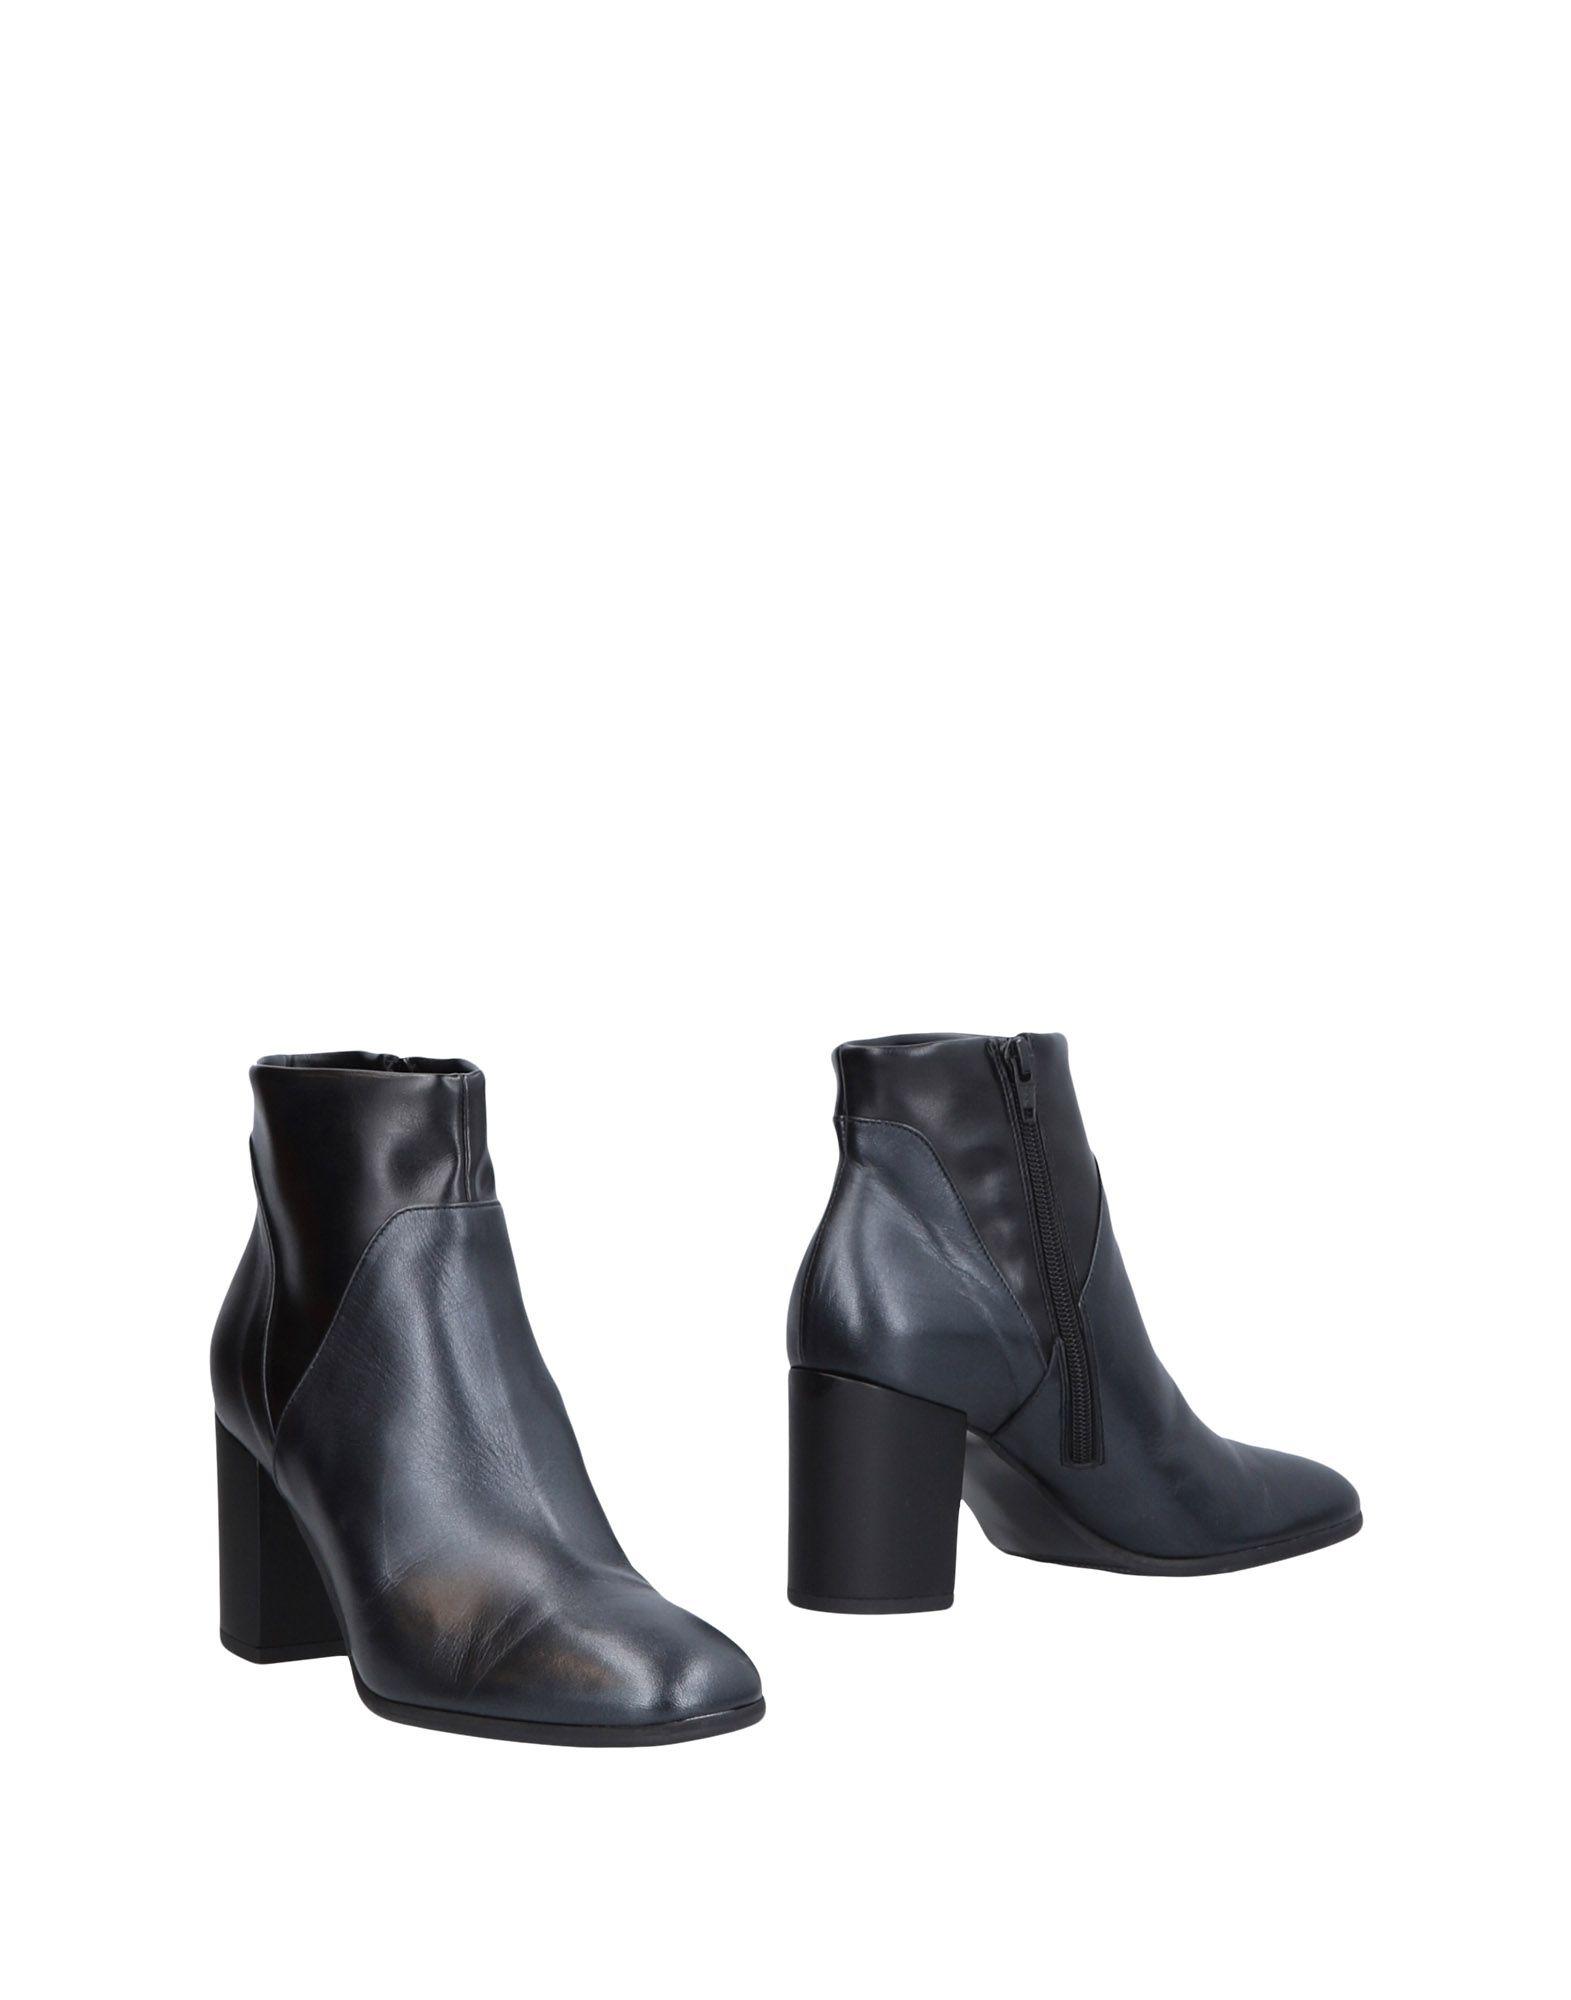 BALDININI TREND Полусапоги и высокие ботинки полусапоги baldinini полусапоги